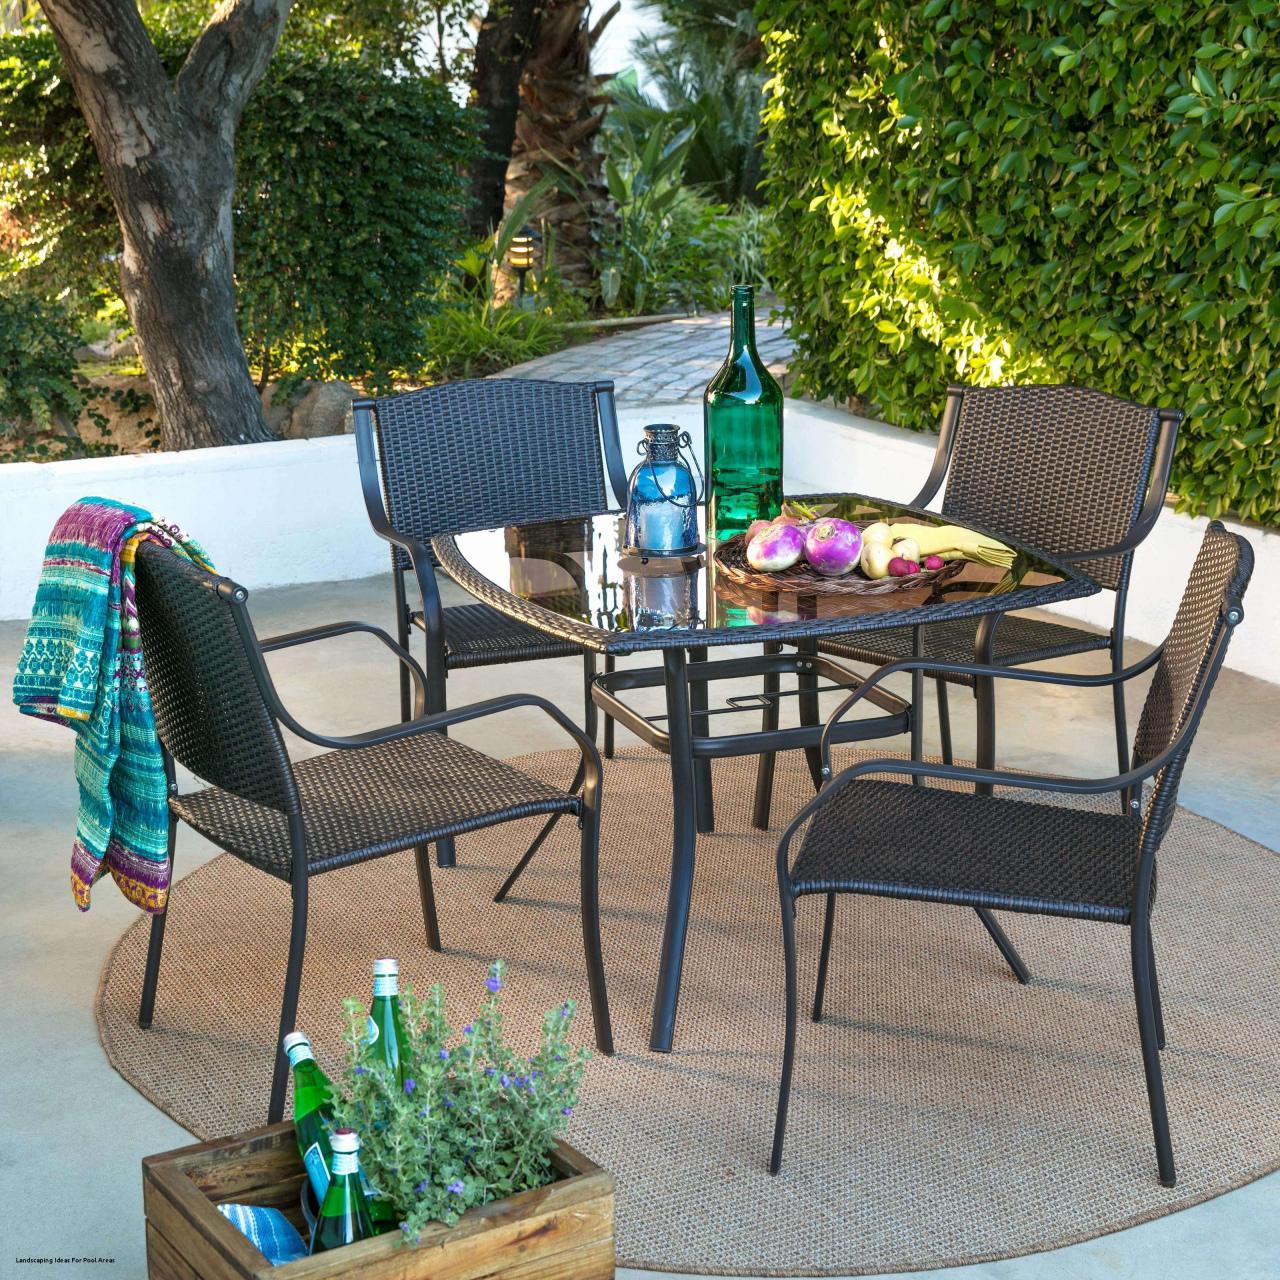 backyard patio ideas coral coast patio furniture fresh wicker outdoor sofa 0d patio durch backyard patio ideas